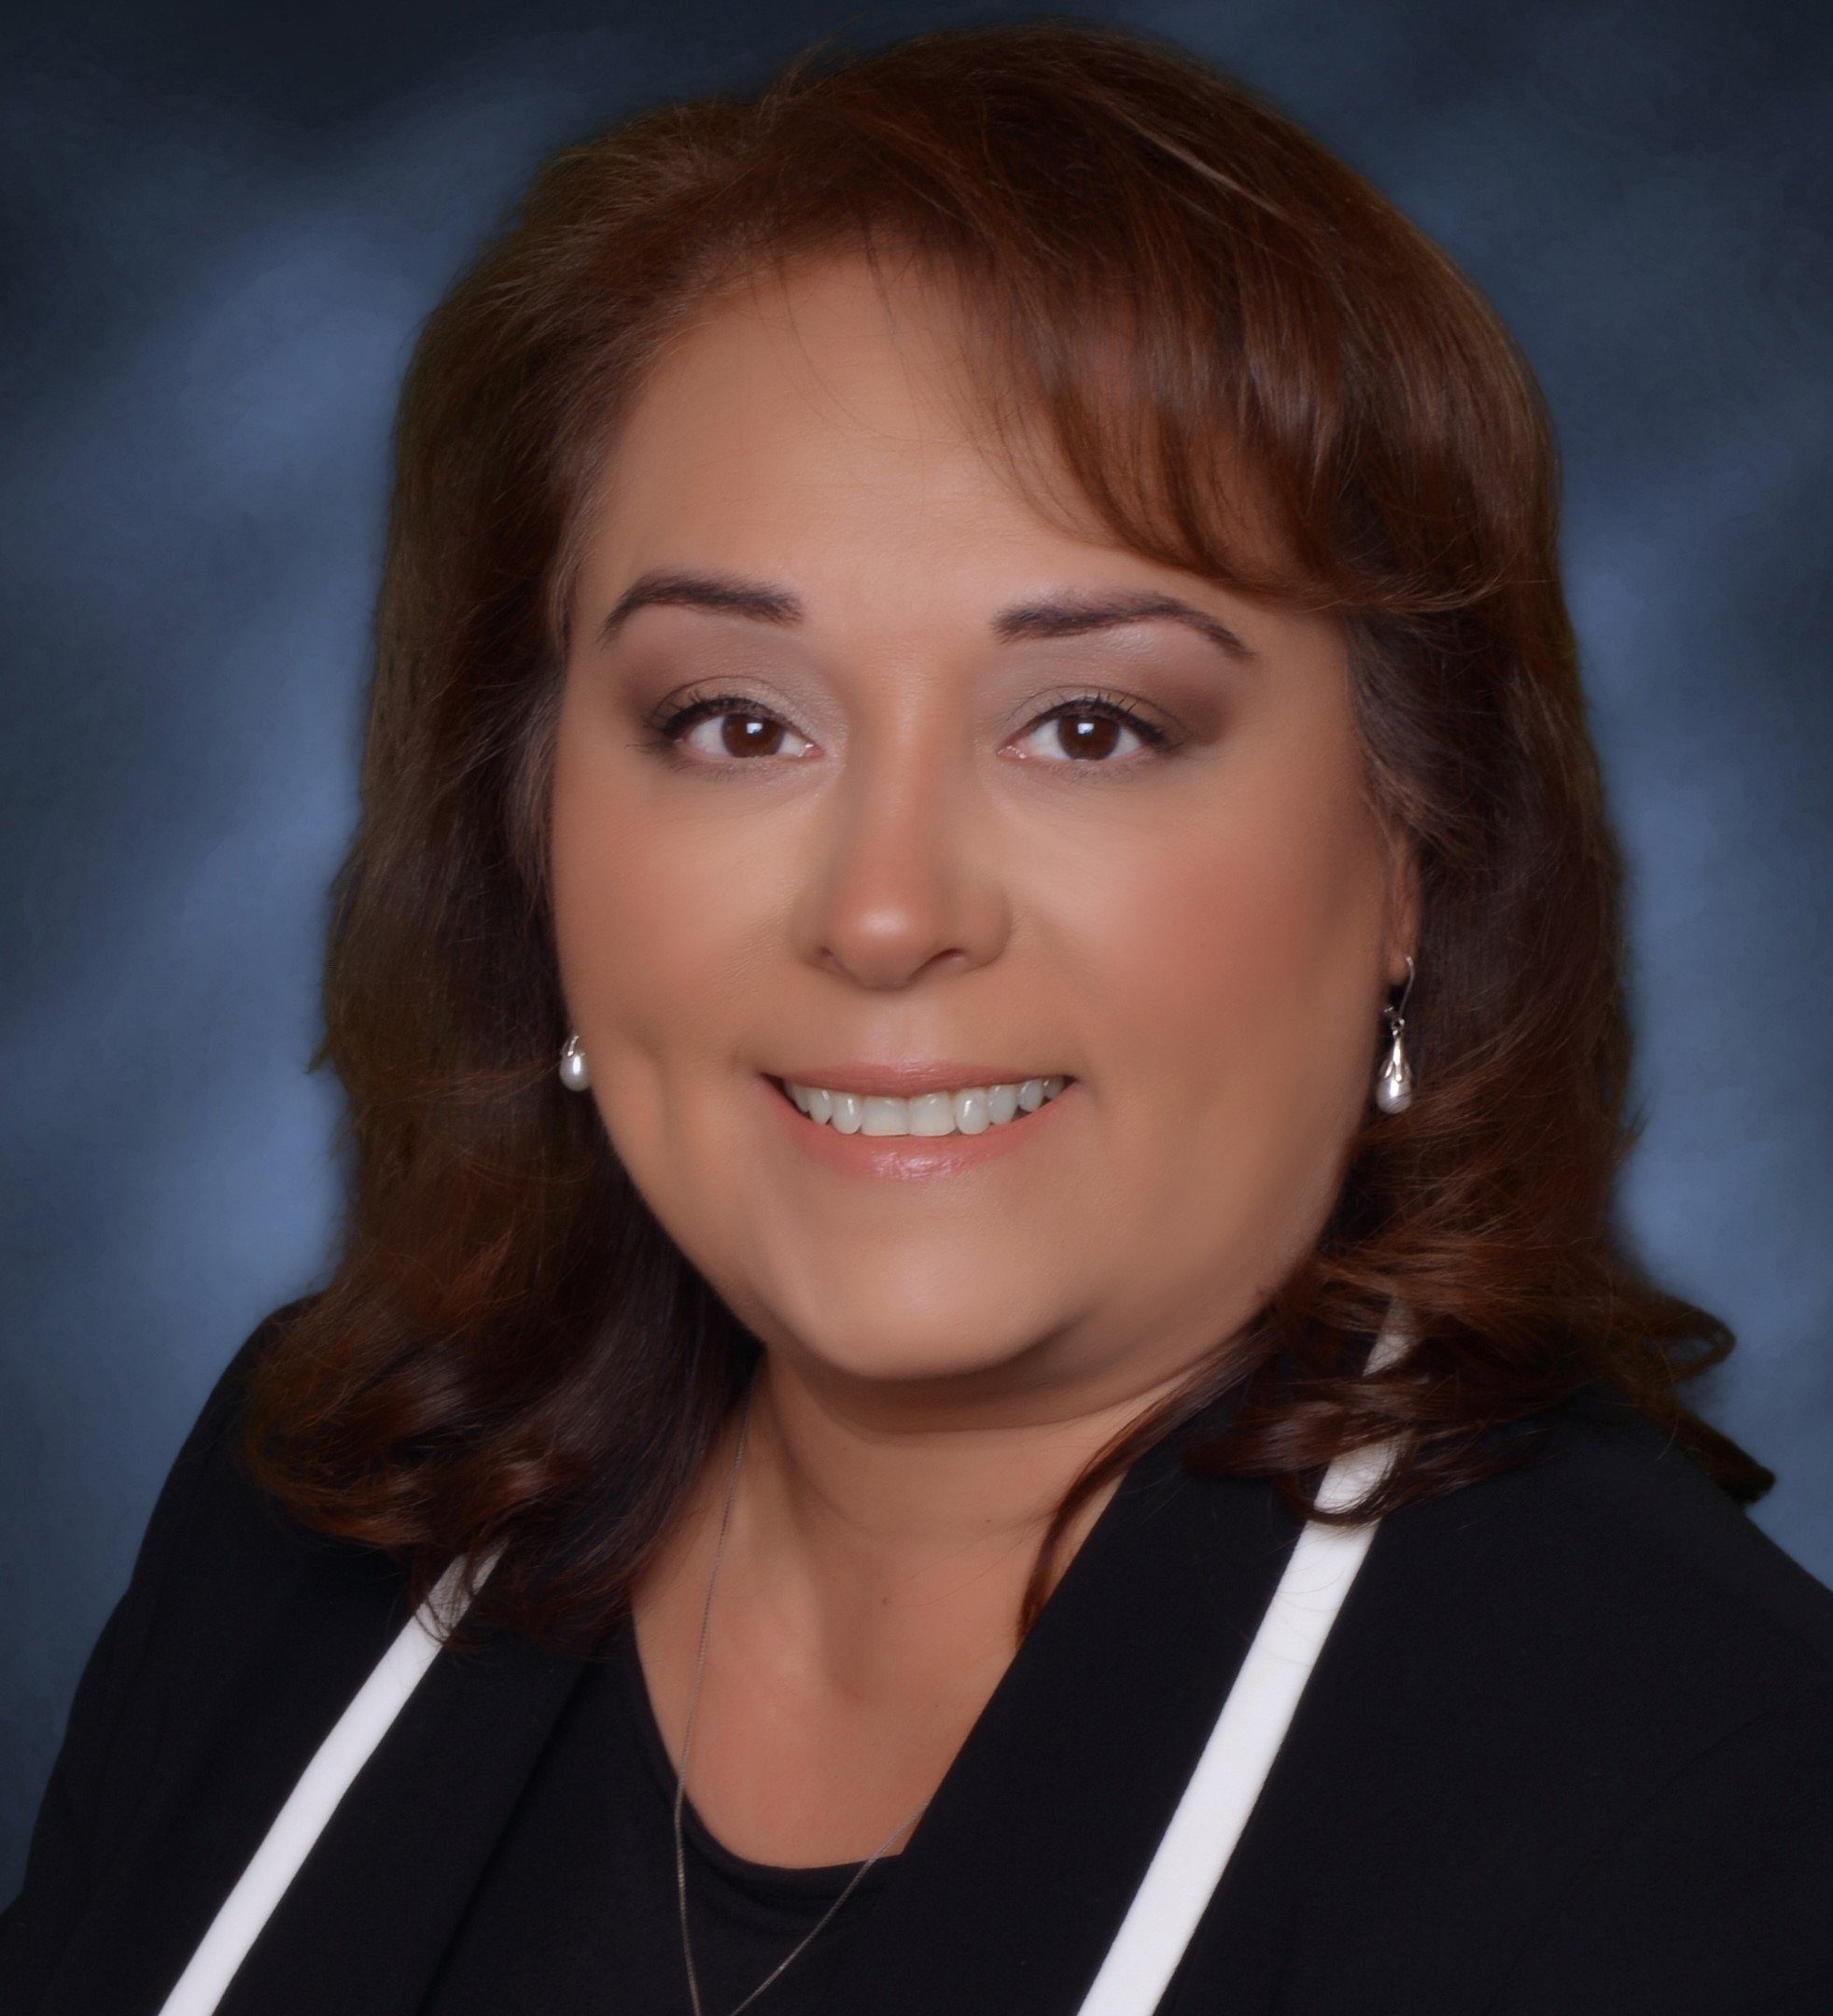 IRENE RUBIO Financial Professional & Insurance Agent